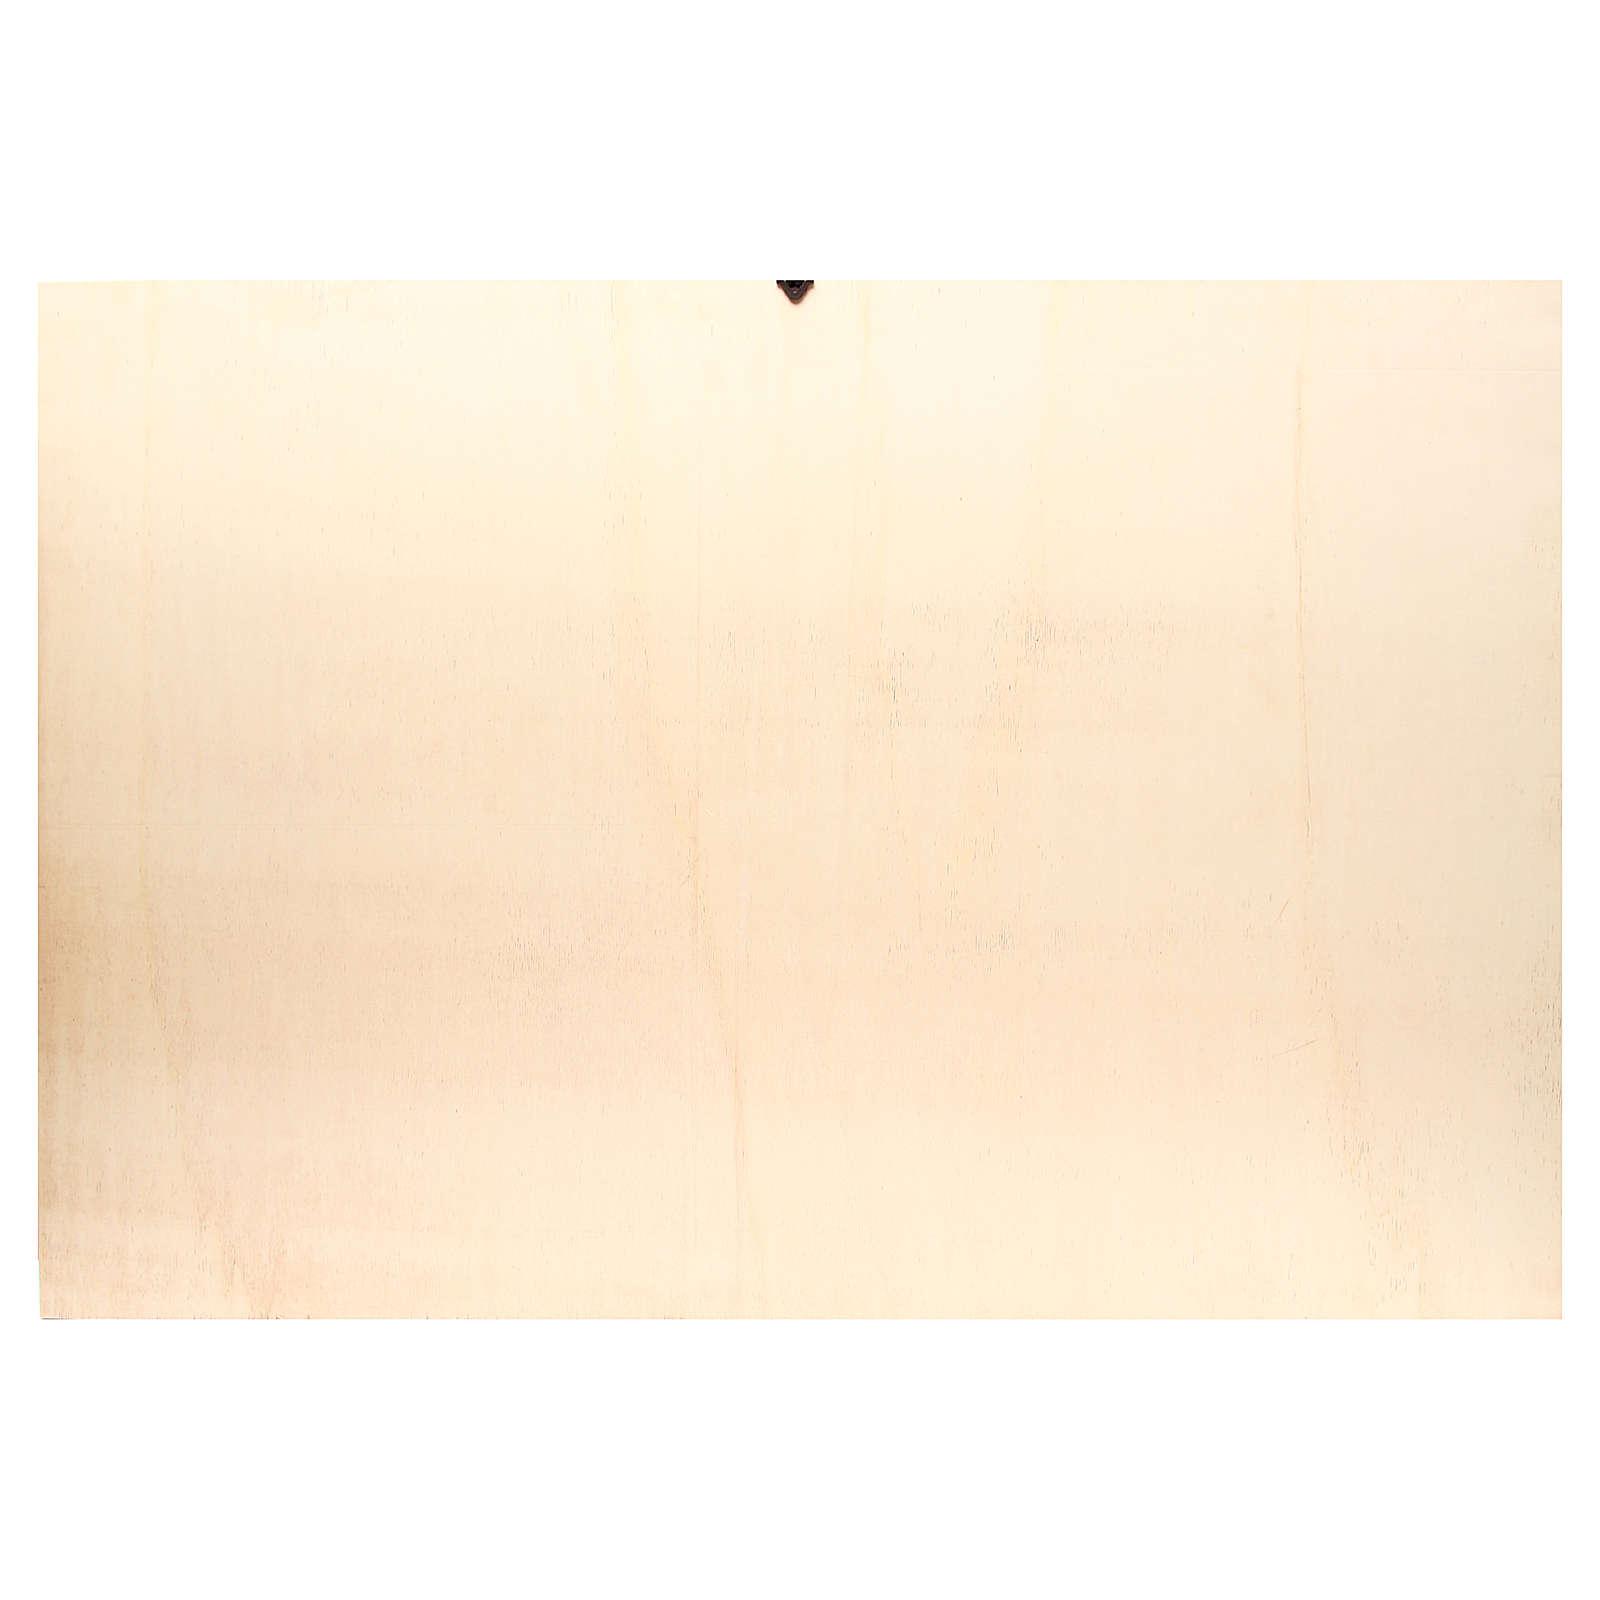 Fondo belén madera paisaje árabe 100x68cm 4